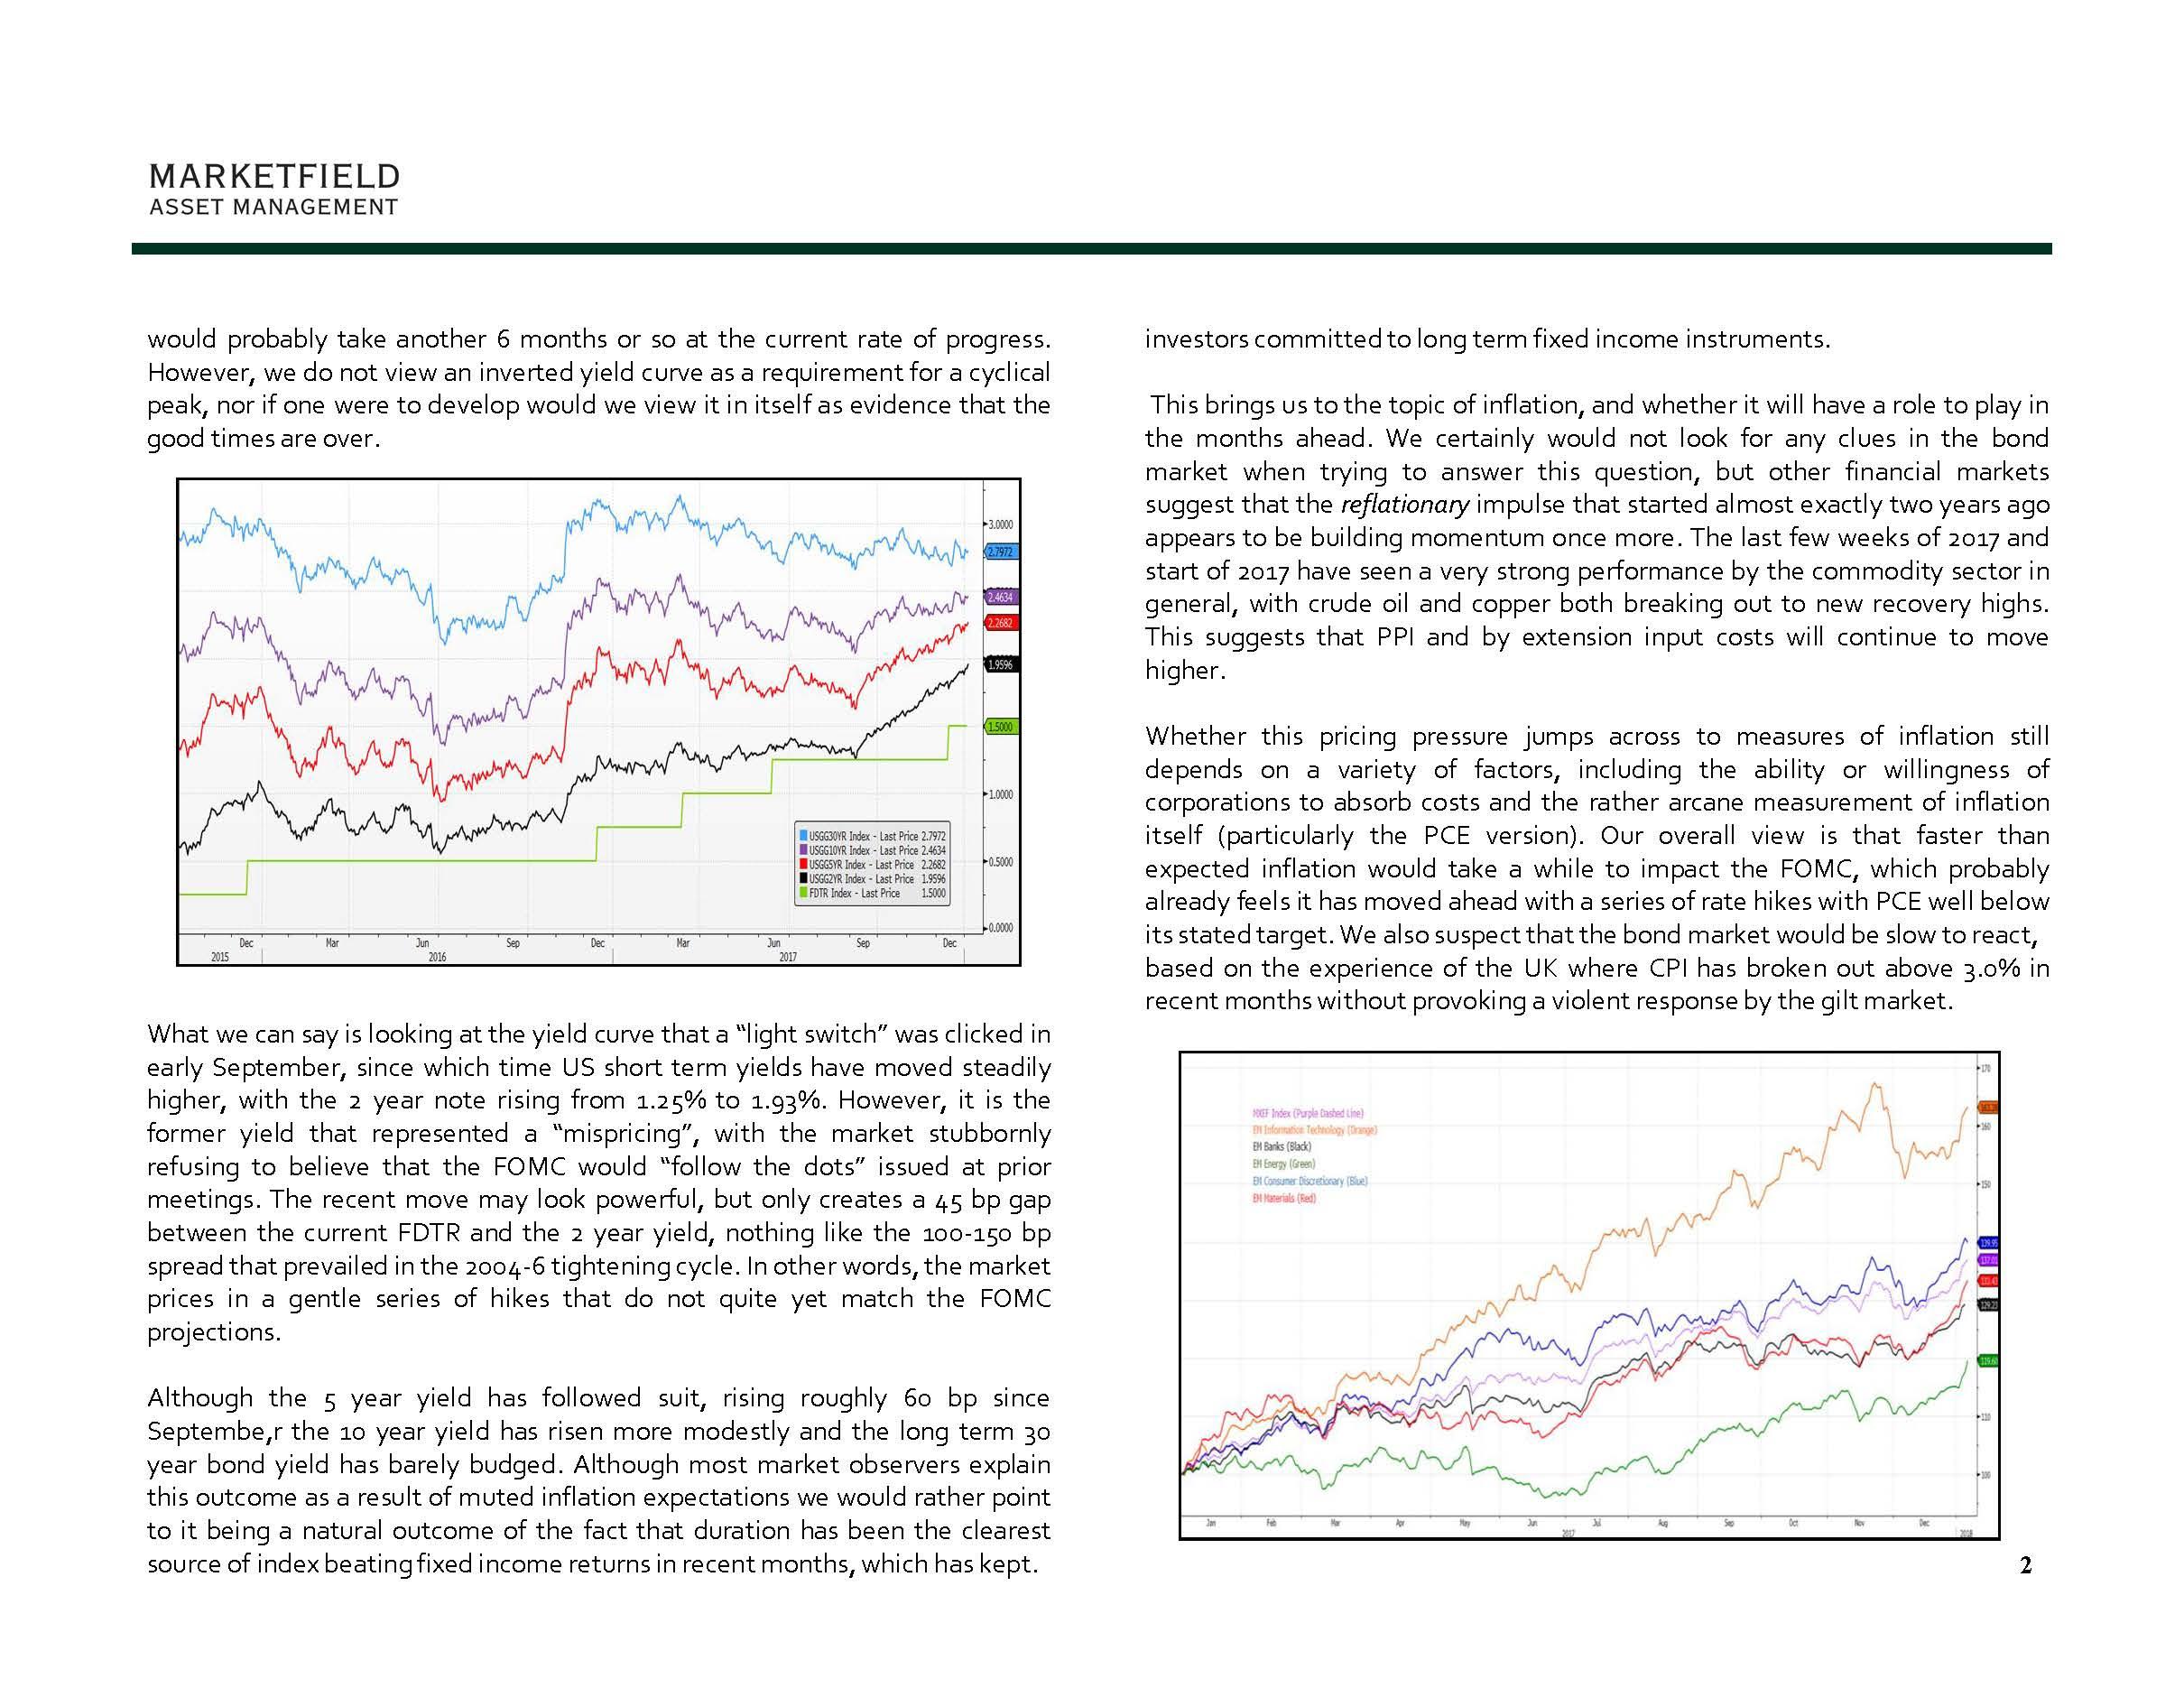 marketfield weekly speculator 01-04-18_Page_02.jpg